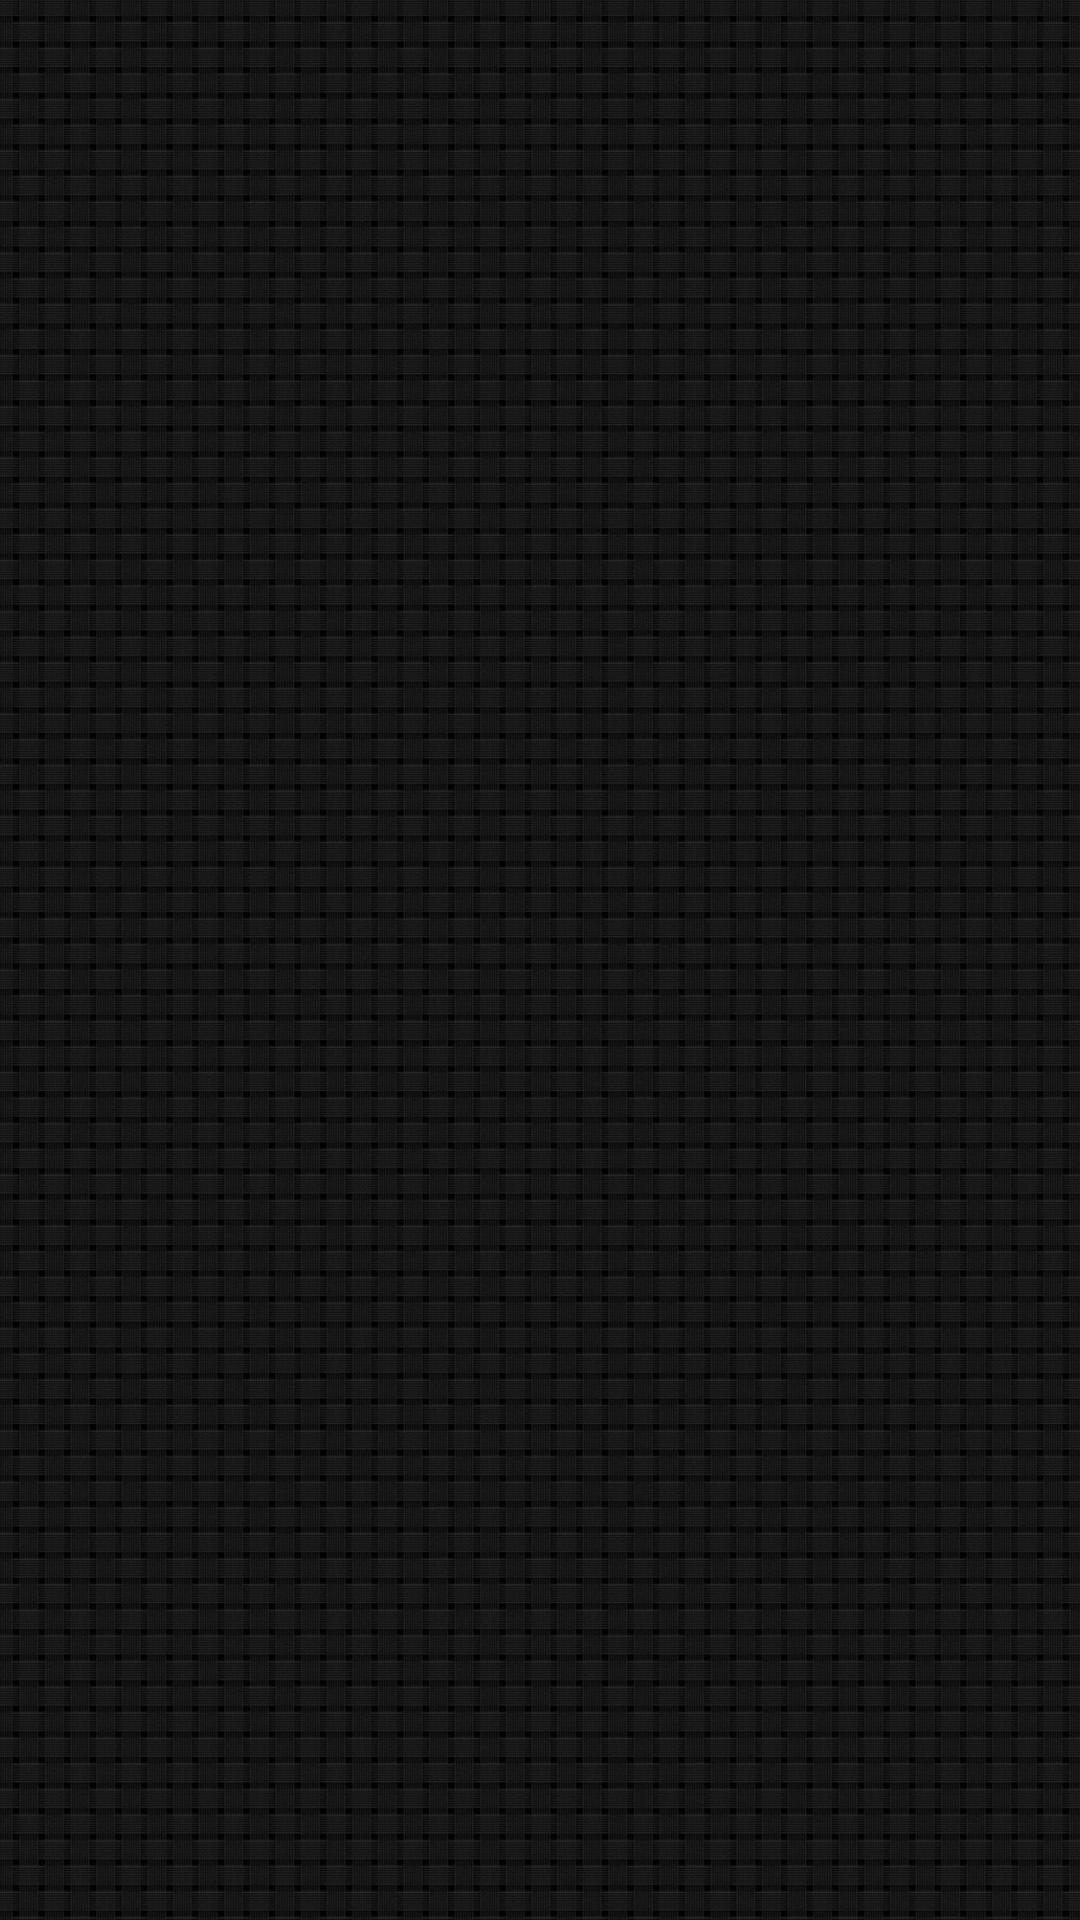 Black Texture 03 Galaxy S5 Wallpapers Samsung Galaxy S5 Wallpapers HD 1080x1920